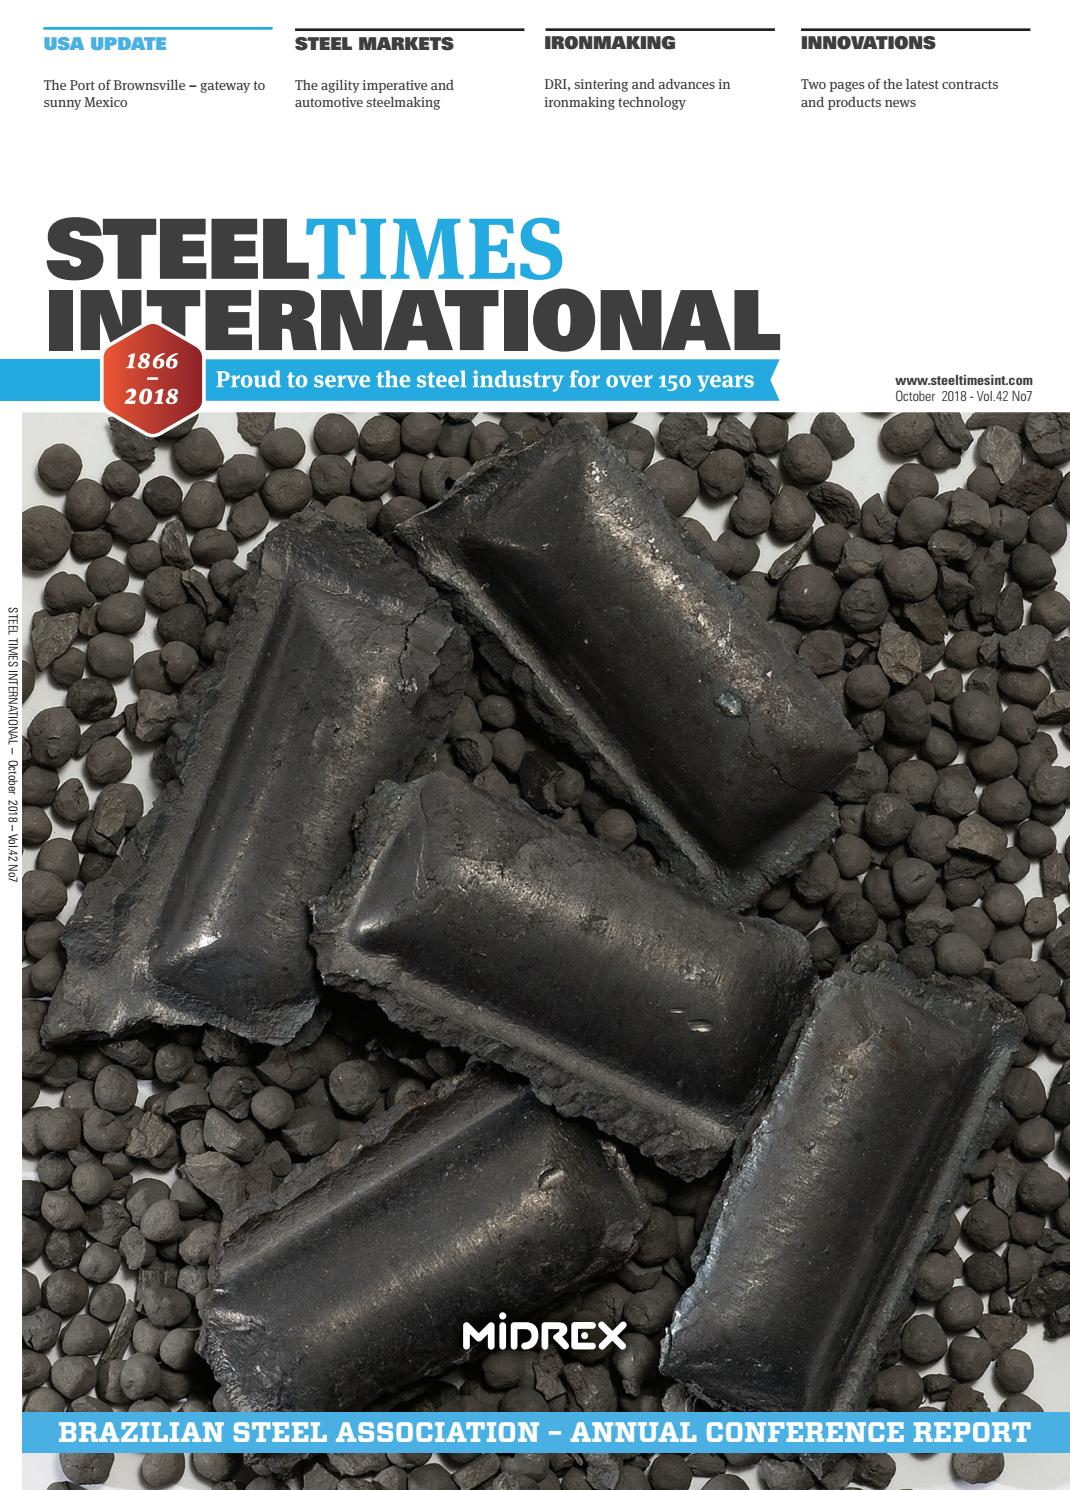 Steel Times International October 2018 by Quartz Business